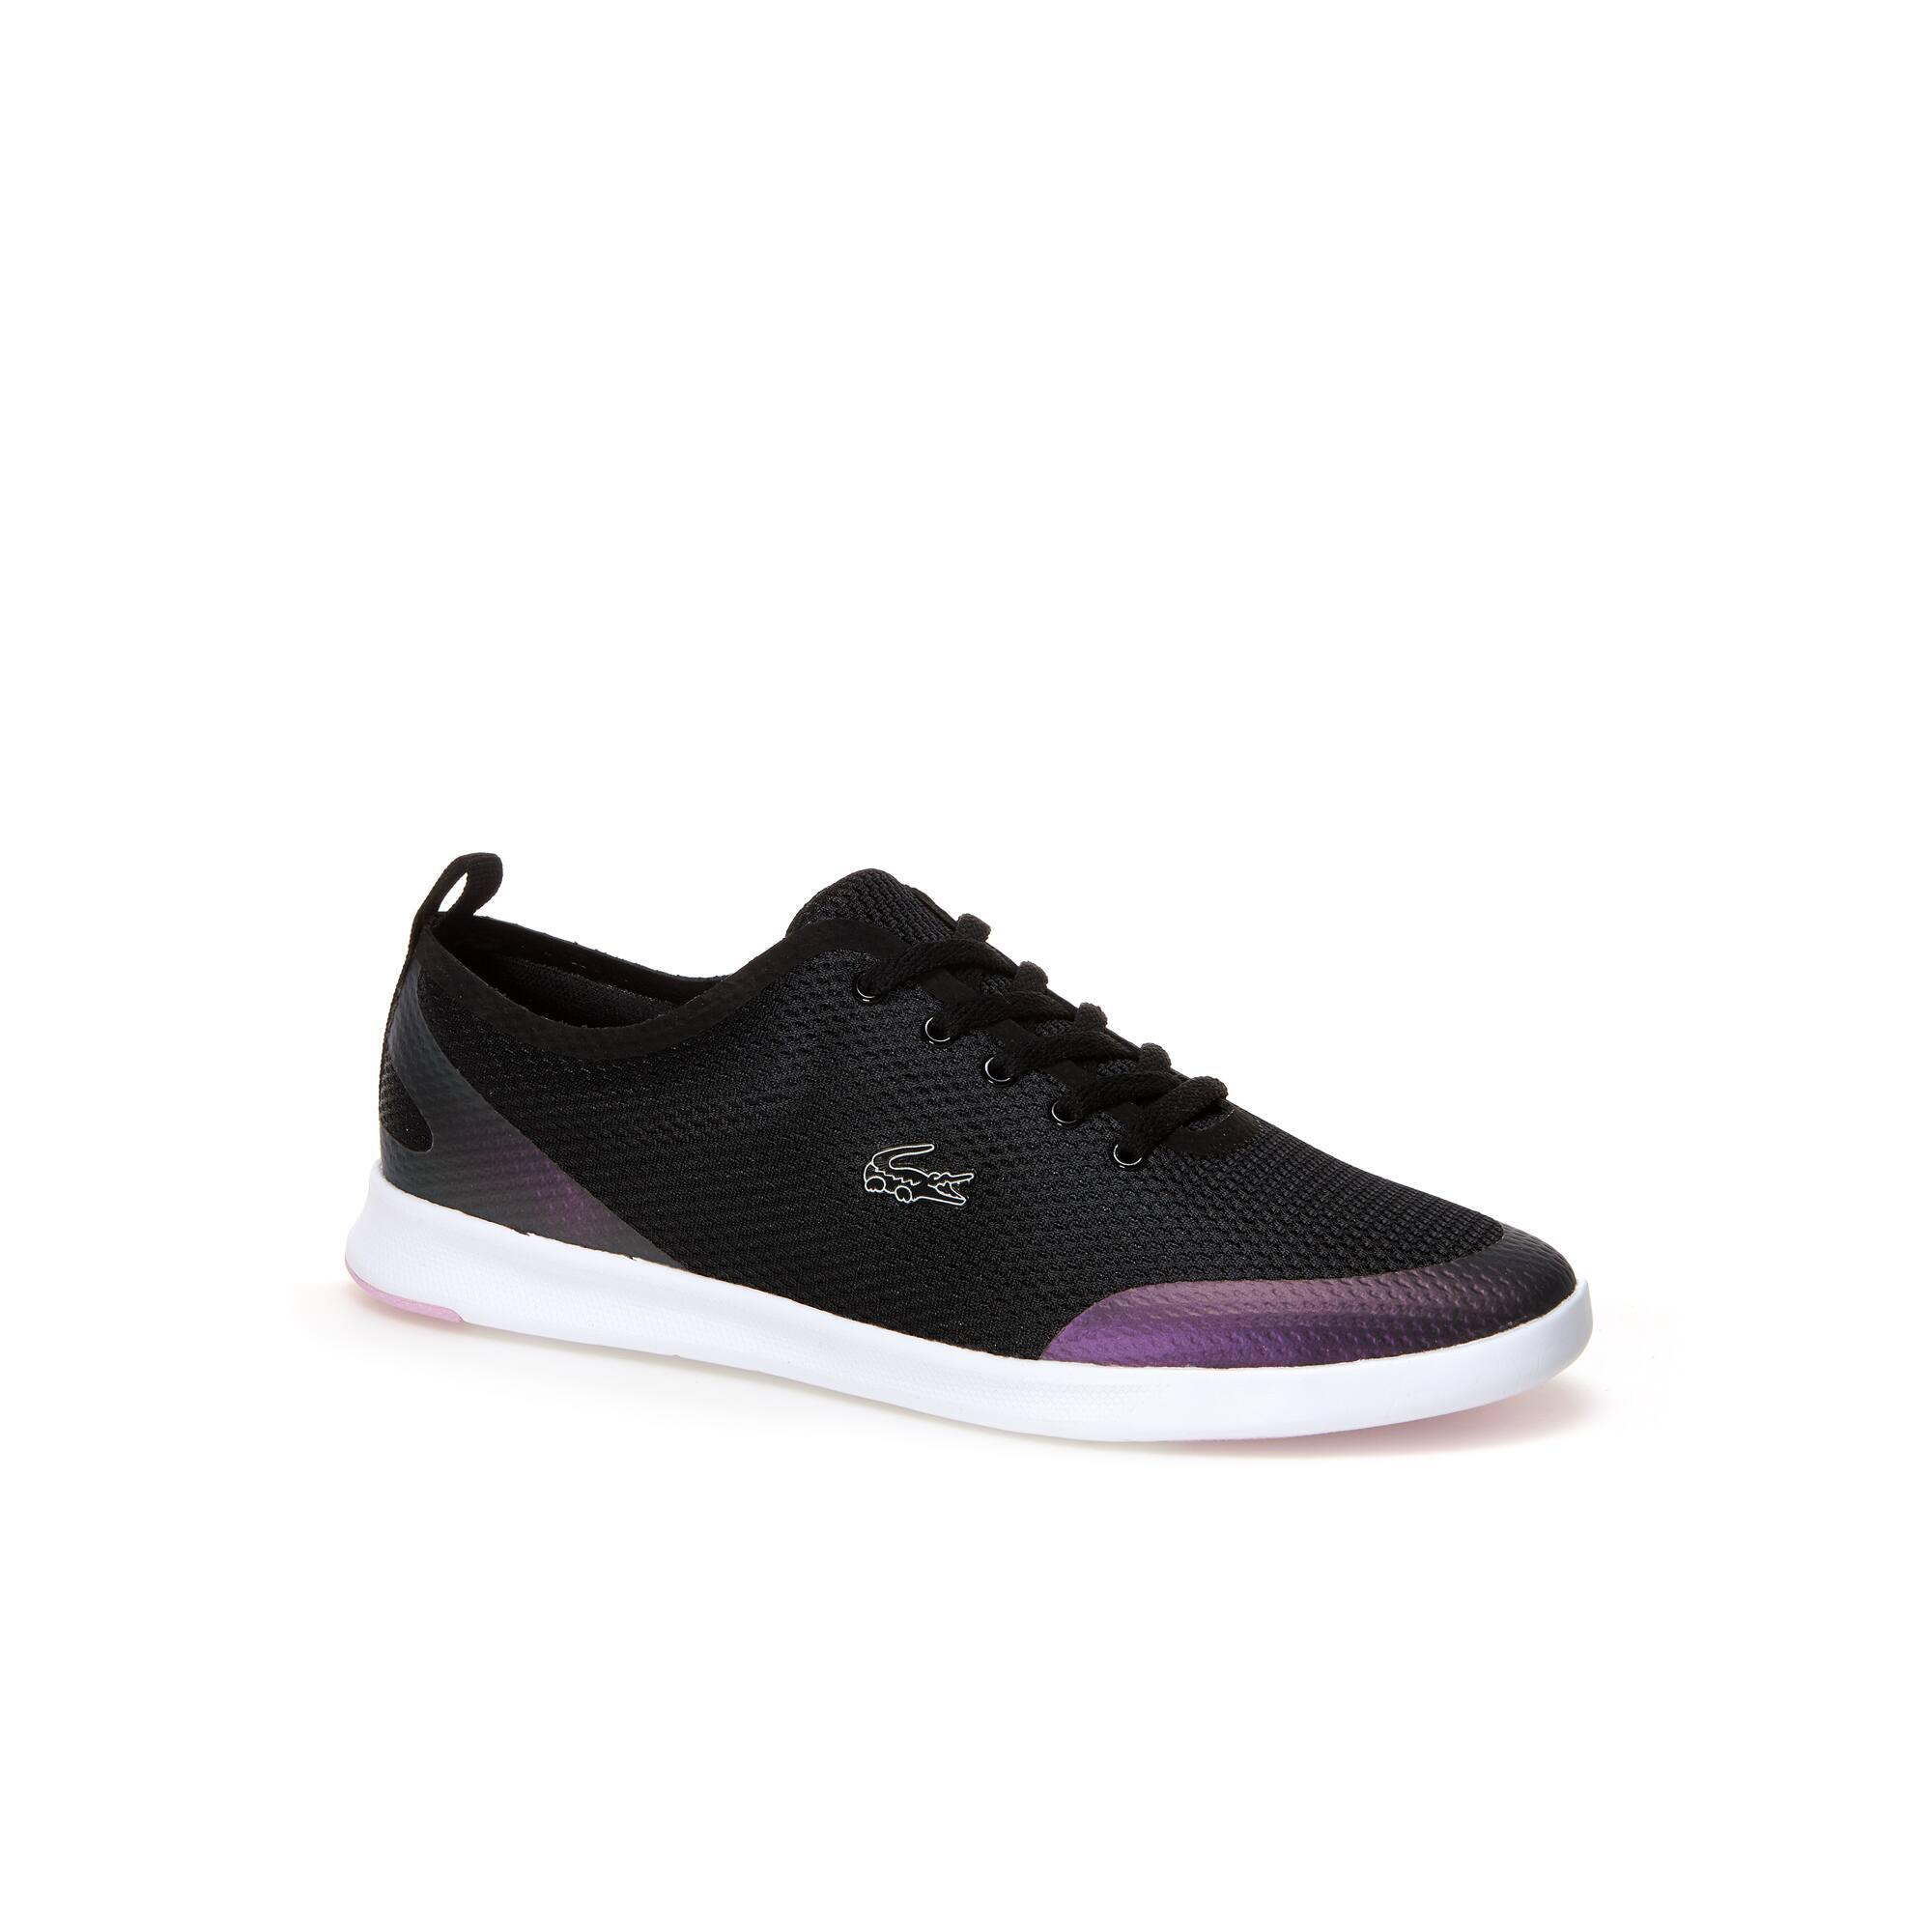 Damen-Sneakers AVENIR aus Stoff